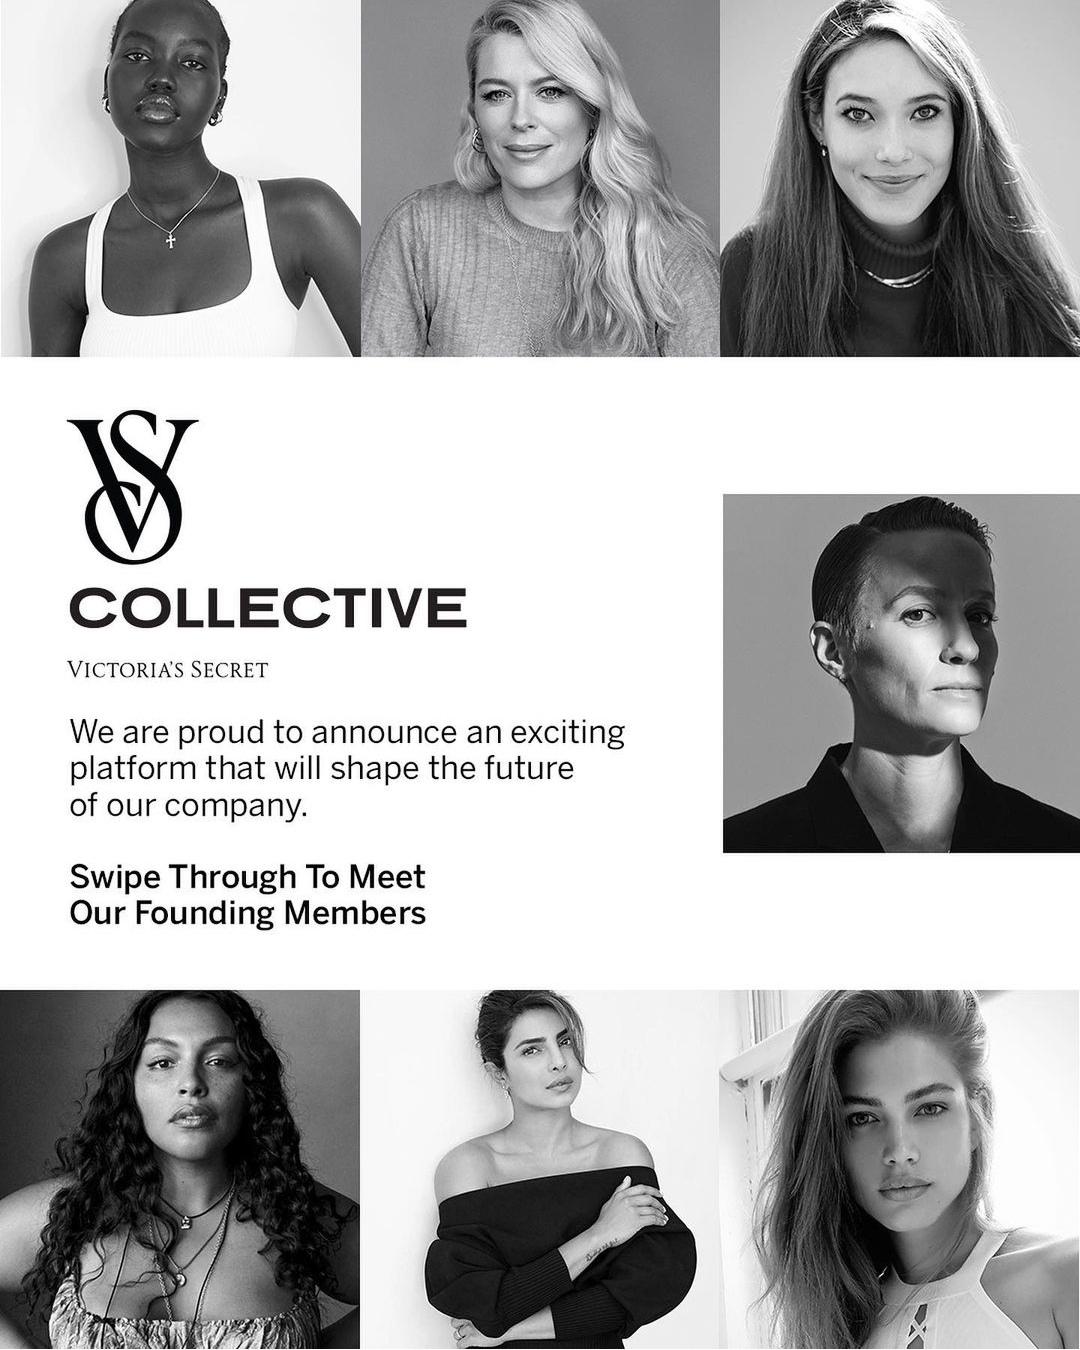 vs collective